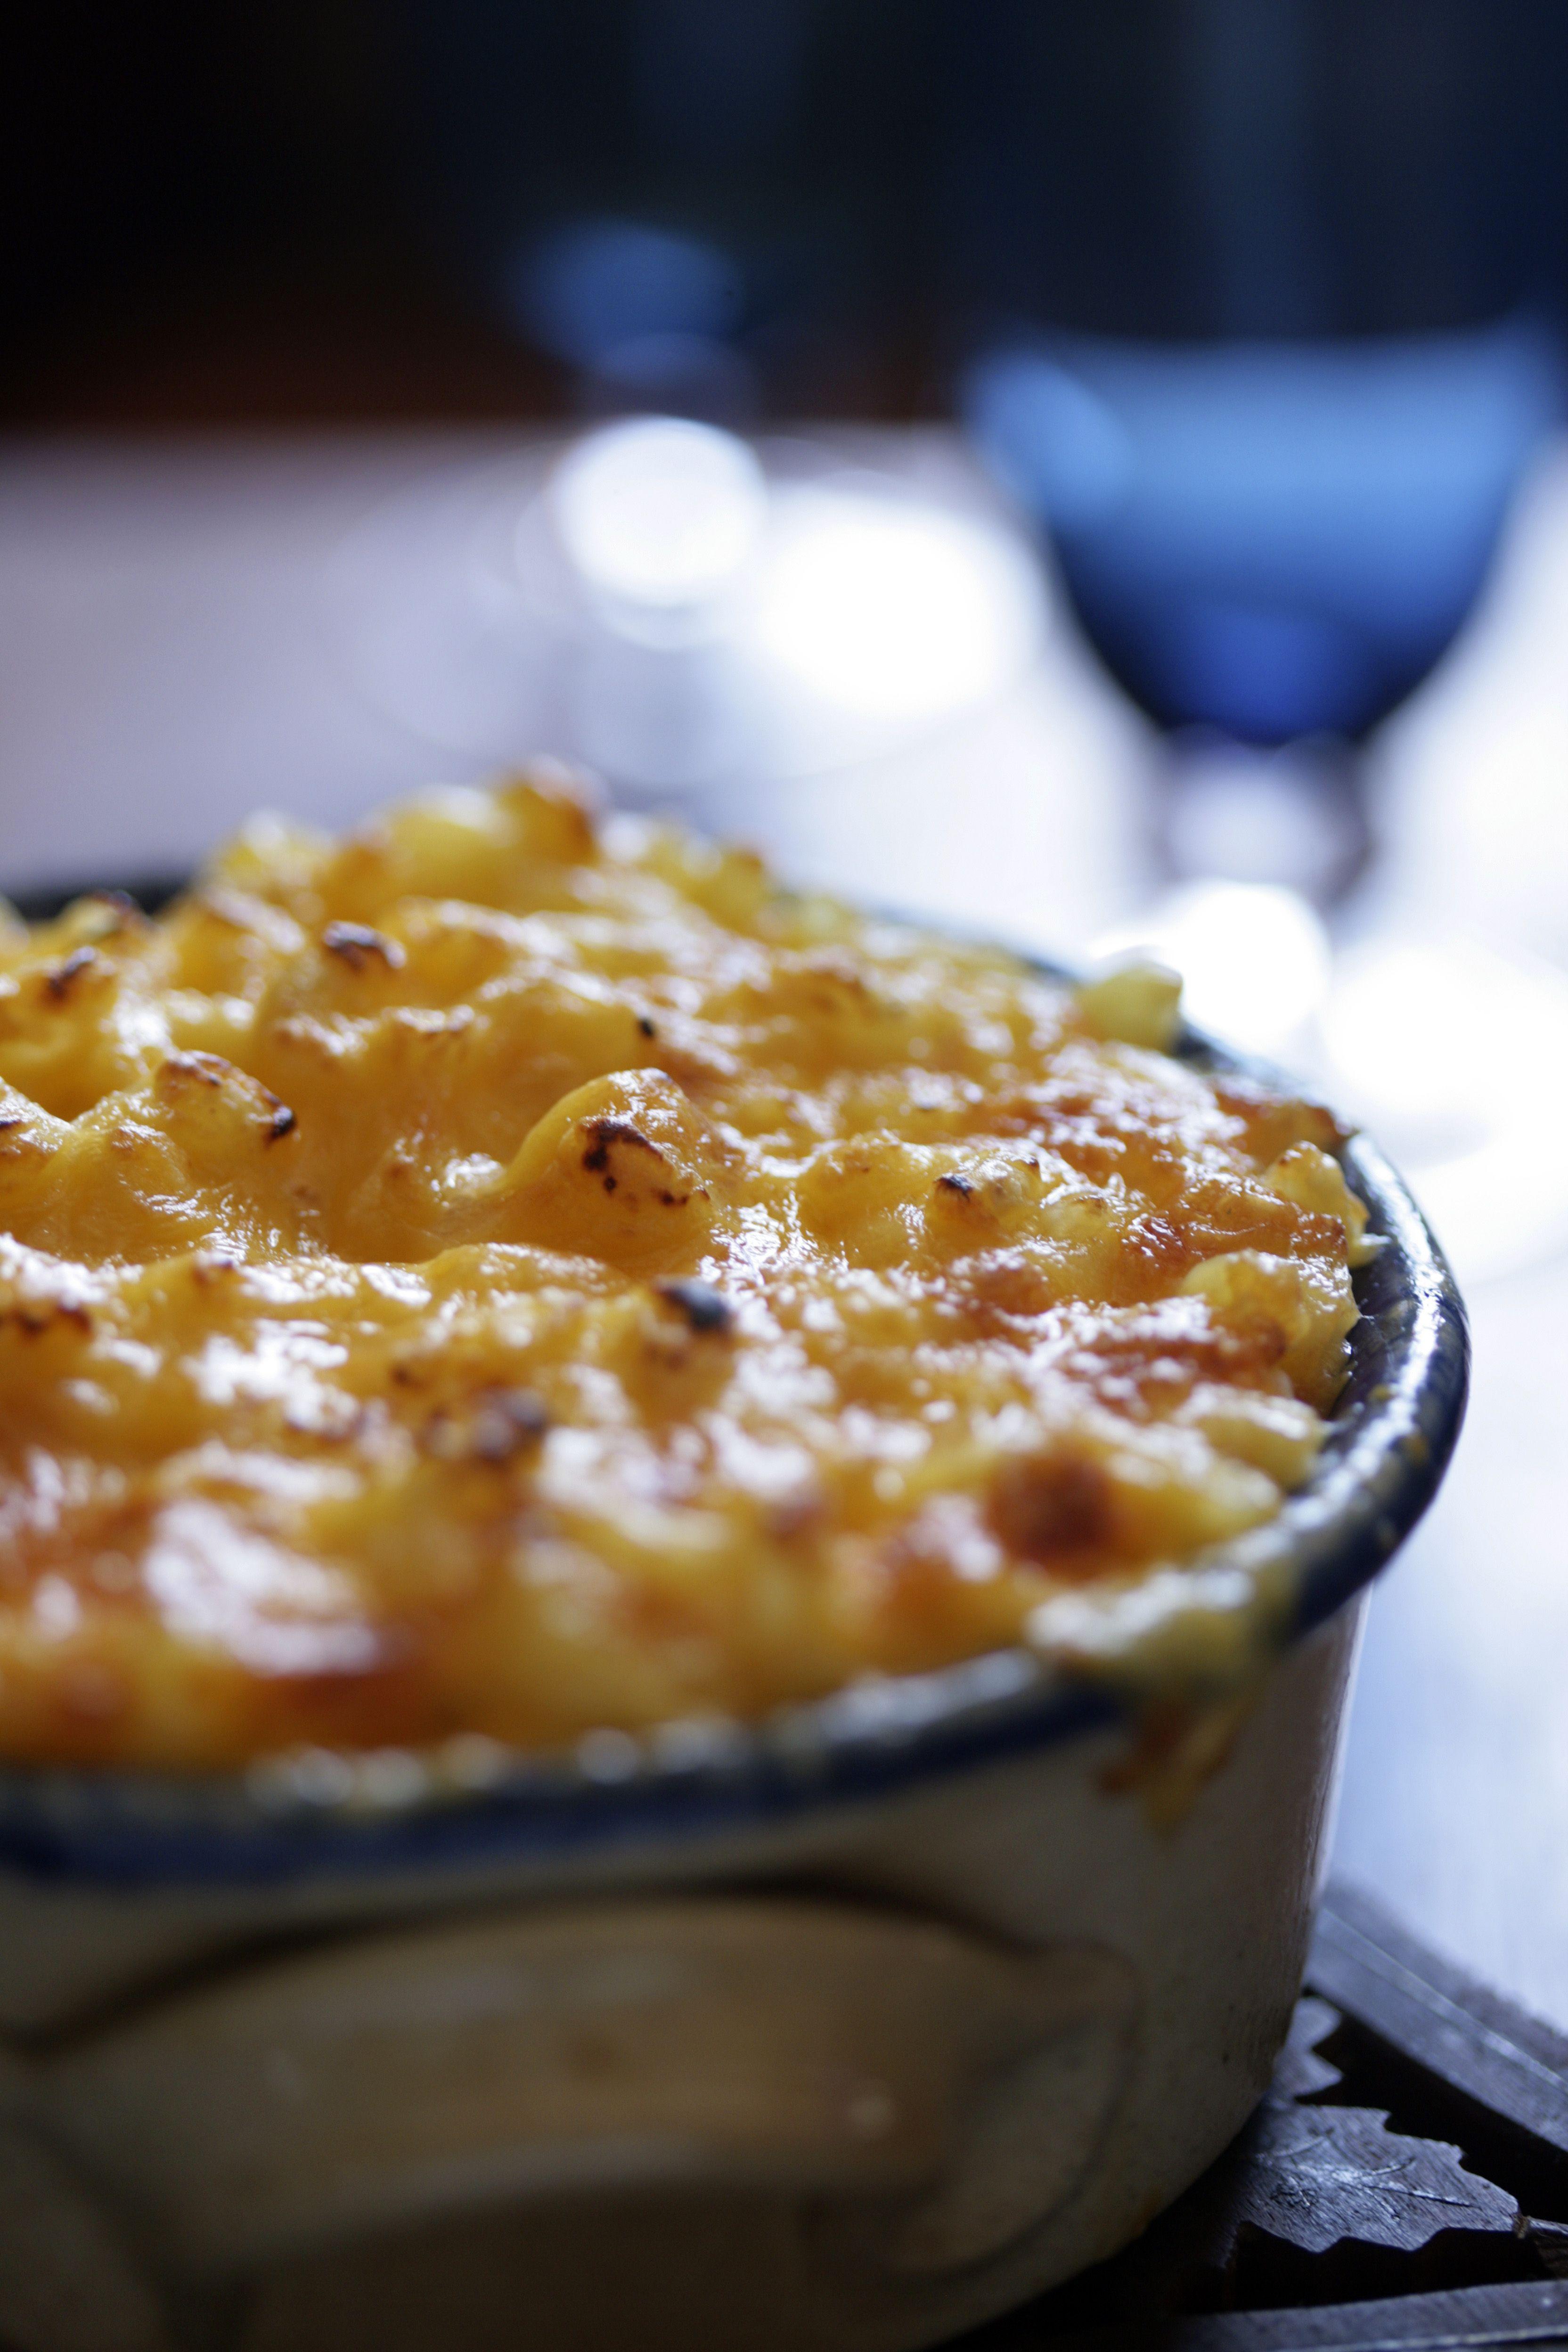 Ina Garten Mac And Cheese Recipe Crusty Macaroni And Cheese  Macaroni Cheese And Recipes